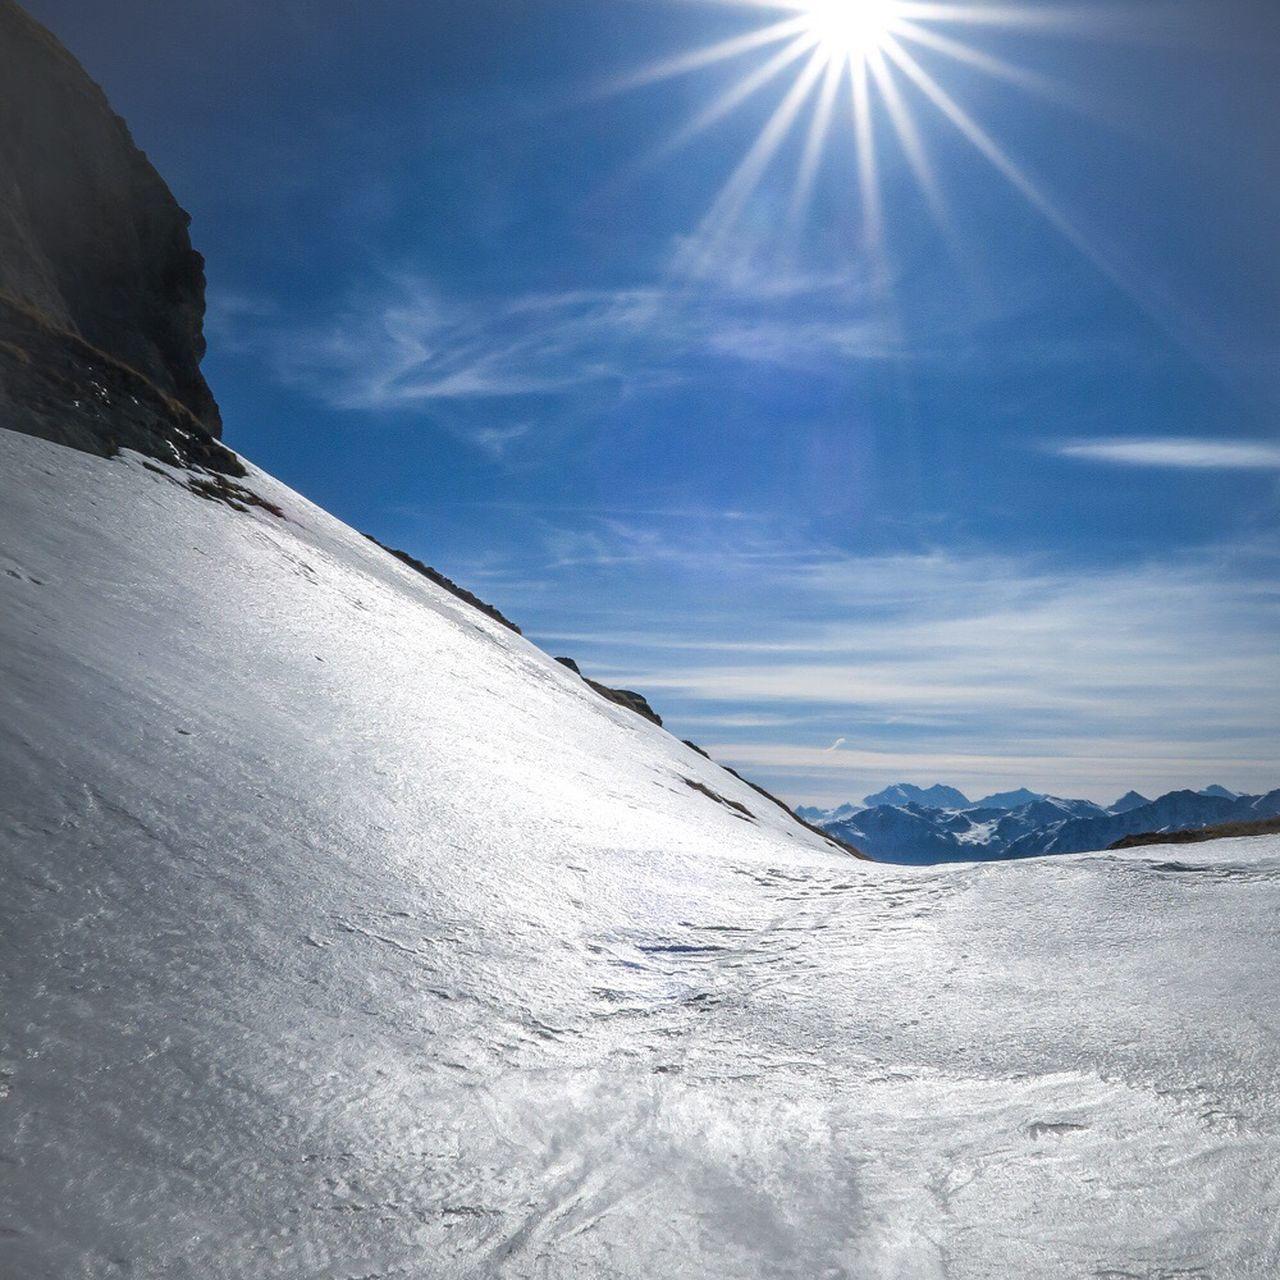 Snow Covered Backlit Snow Alpine Alpen Alpinism Skiing Sun Sunburst High Altitude Cransmontana CMA Mycma Swiss Alps Switzerland Swiss Schweiz